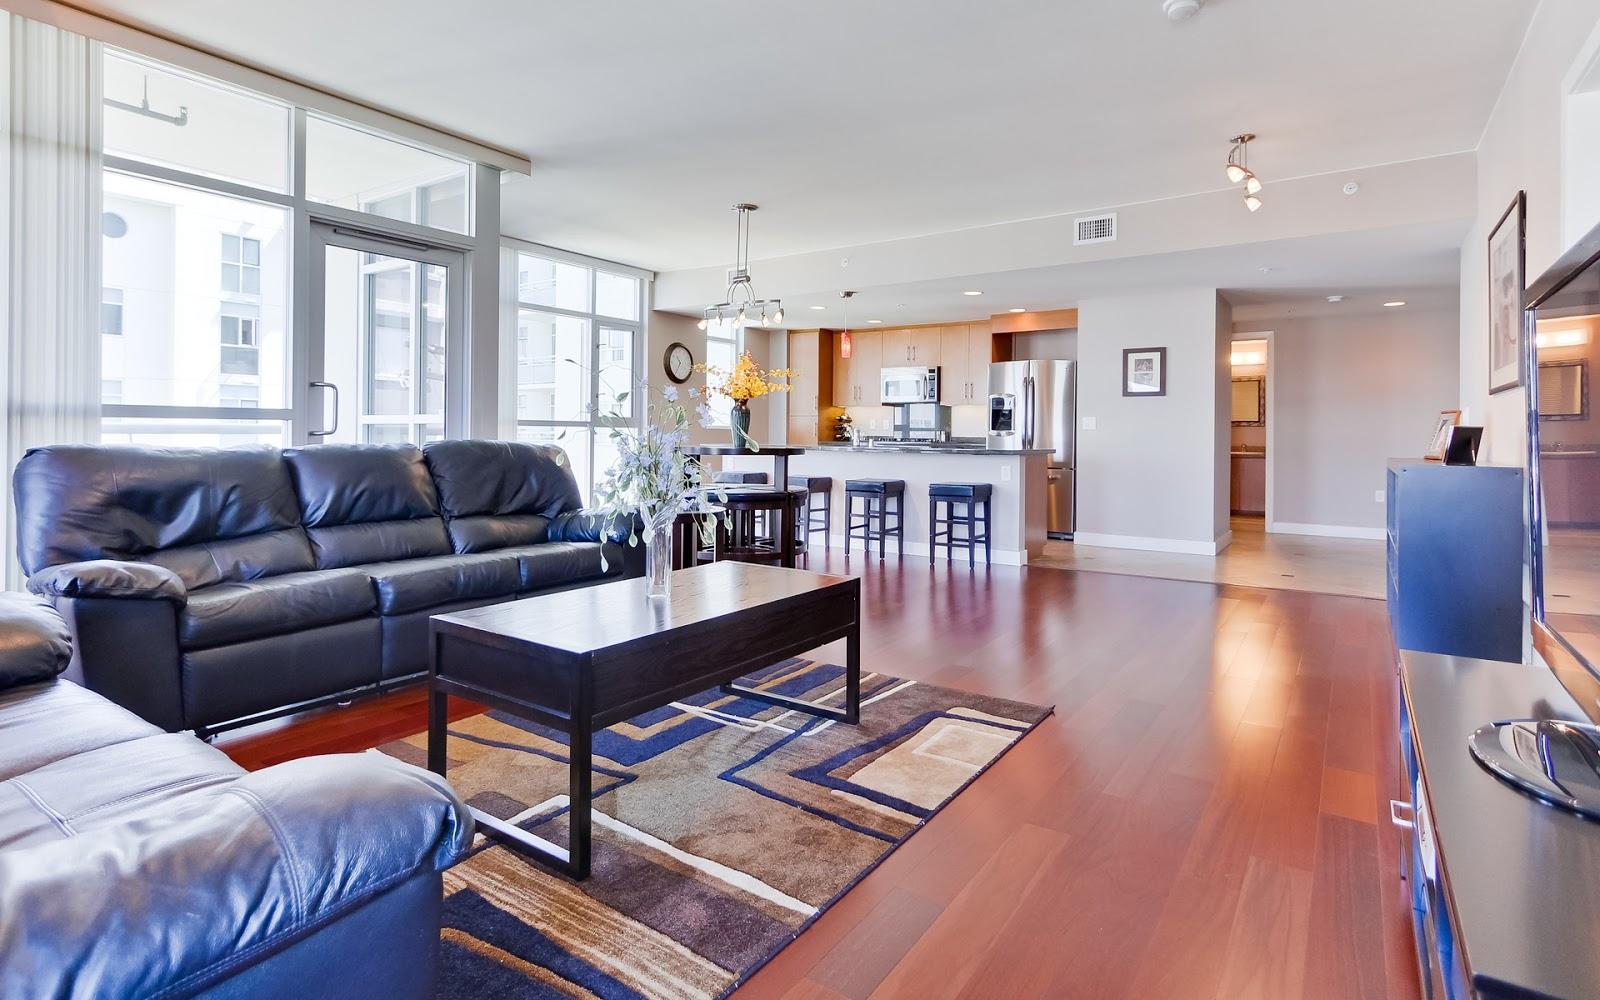 Home Interior Decorating: Interior Design HD Wallpapers